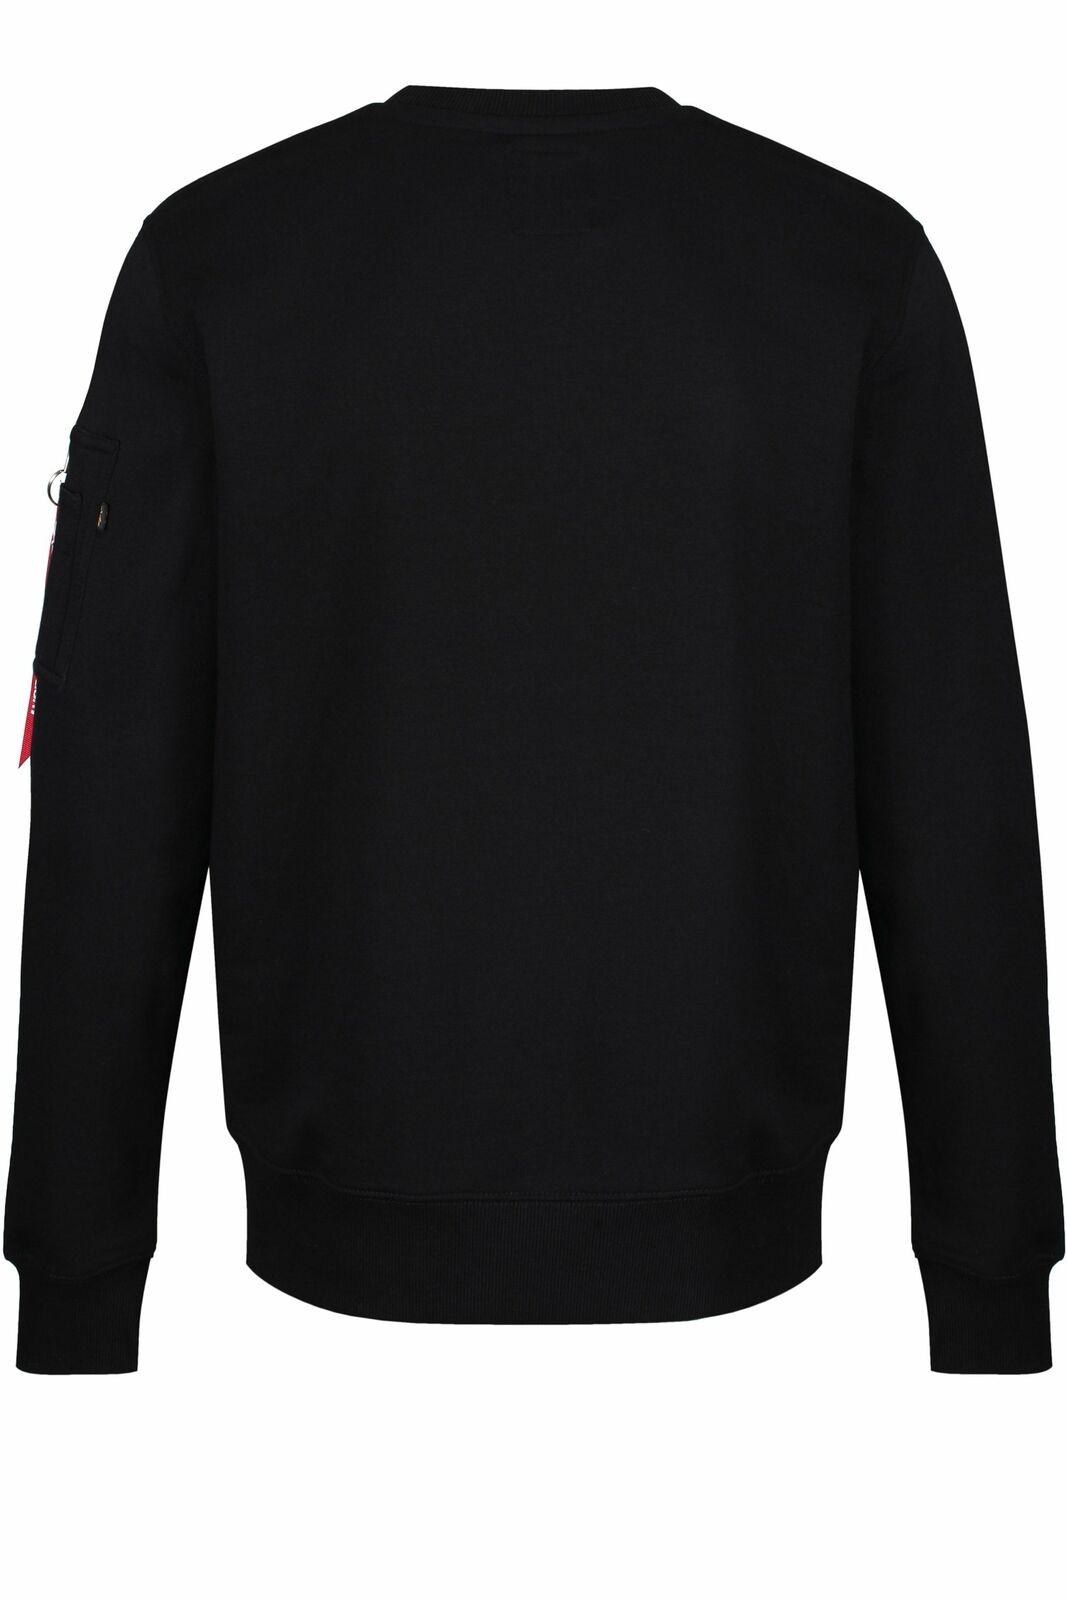 ALPHA INDUSTRIES NASA Reflective Logo Sweat Shirt | Black